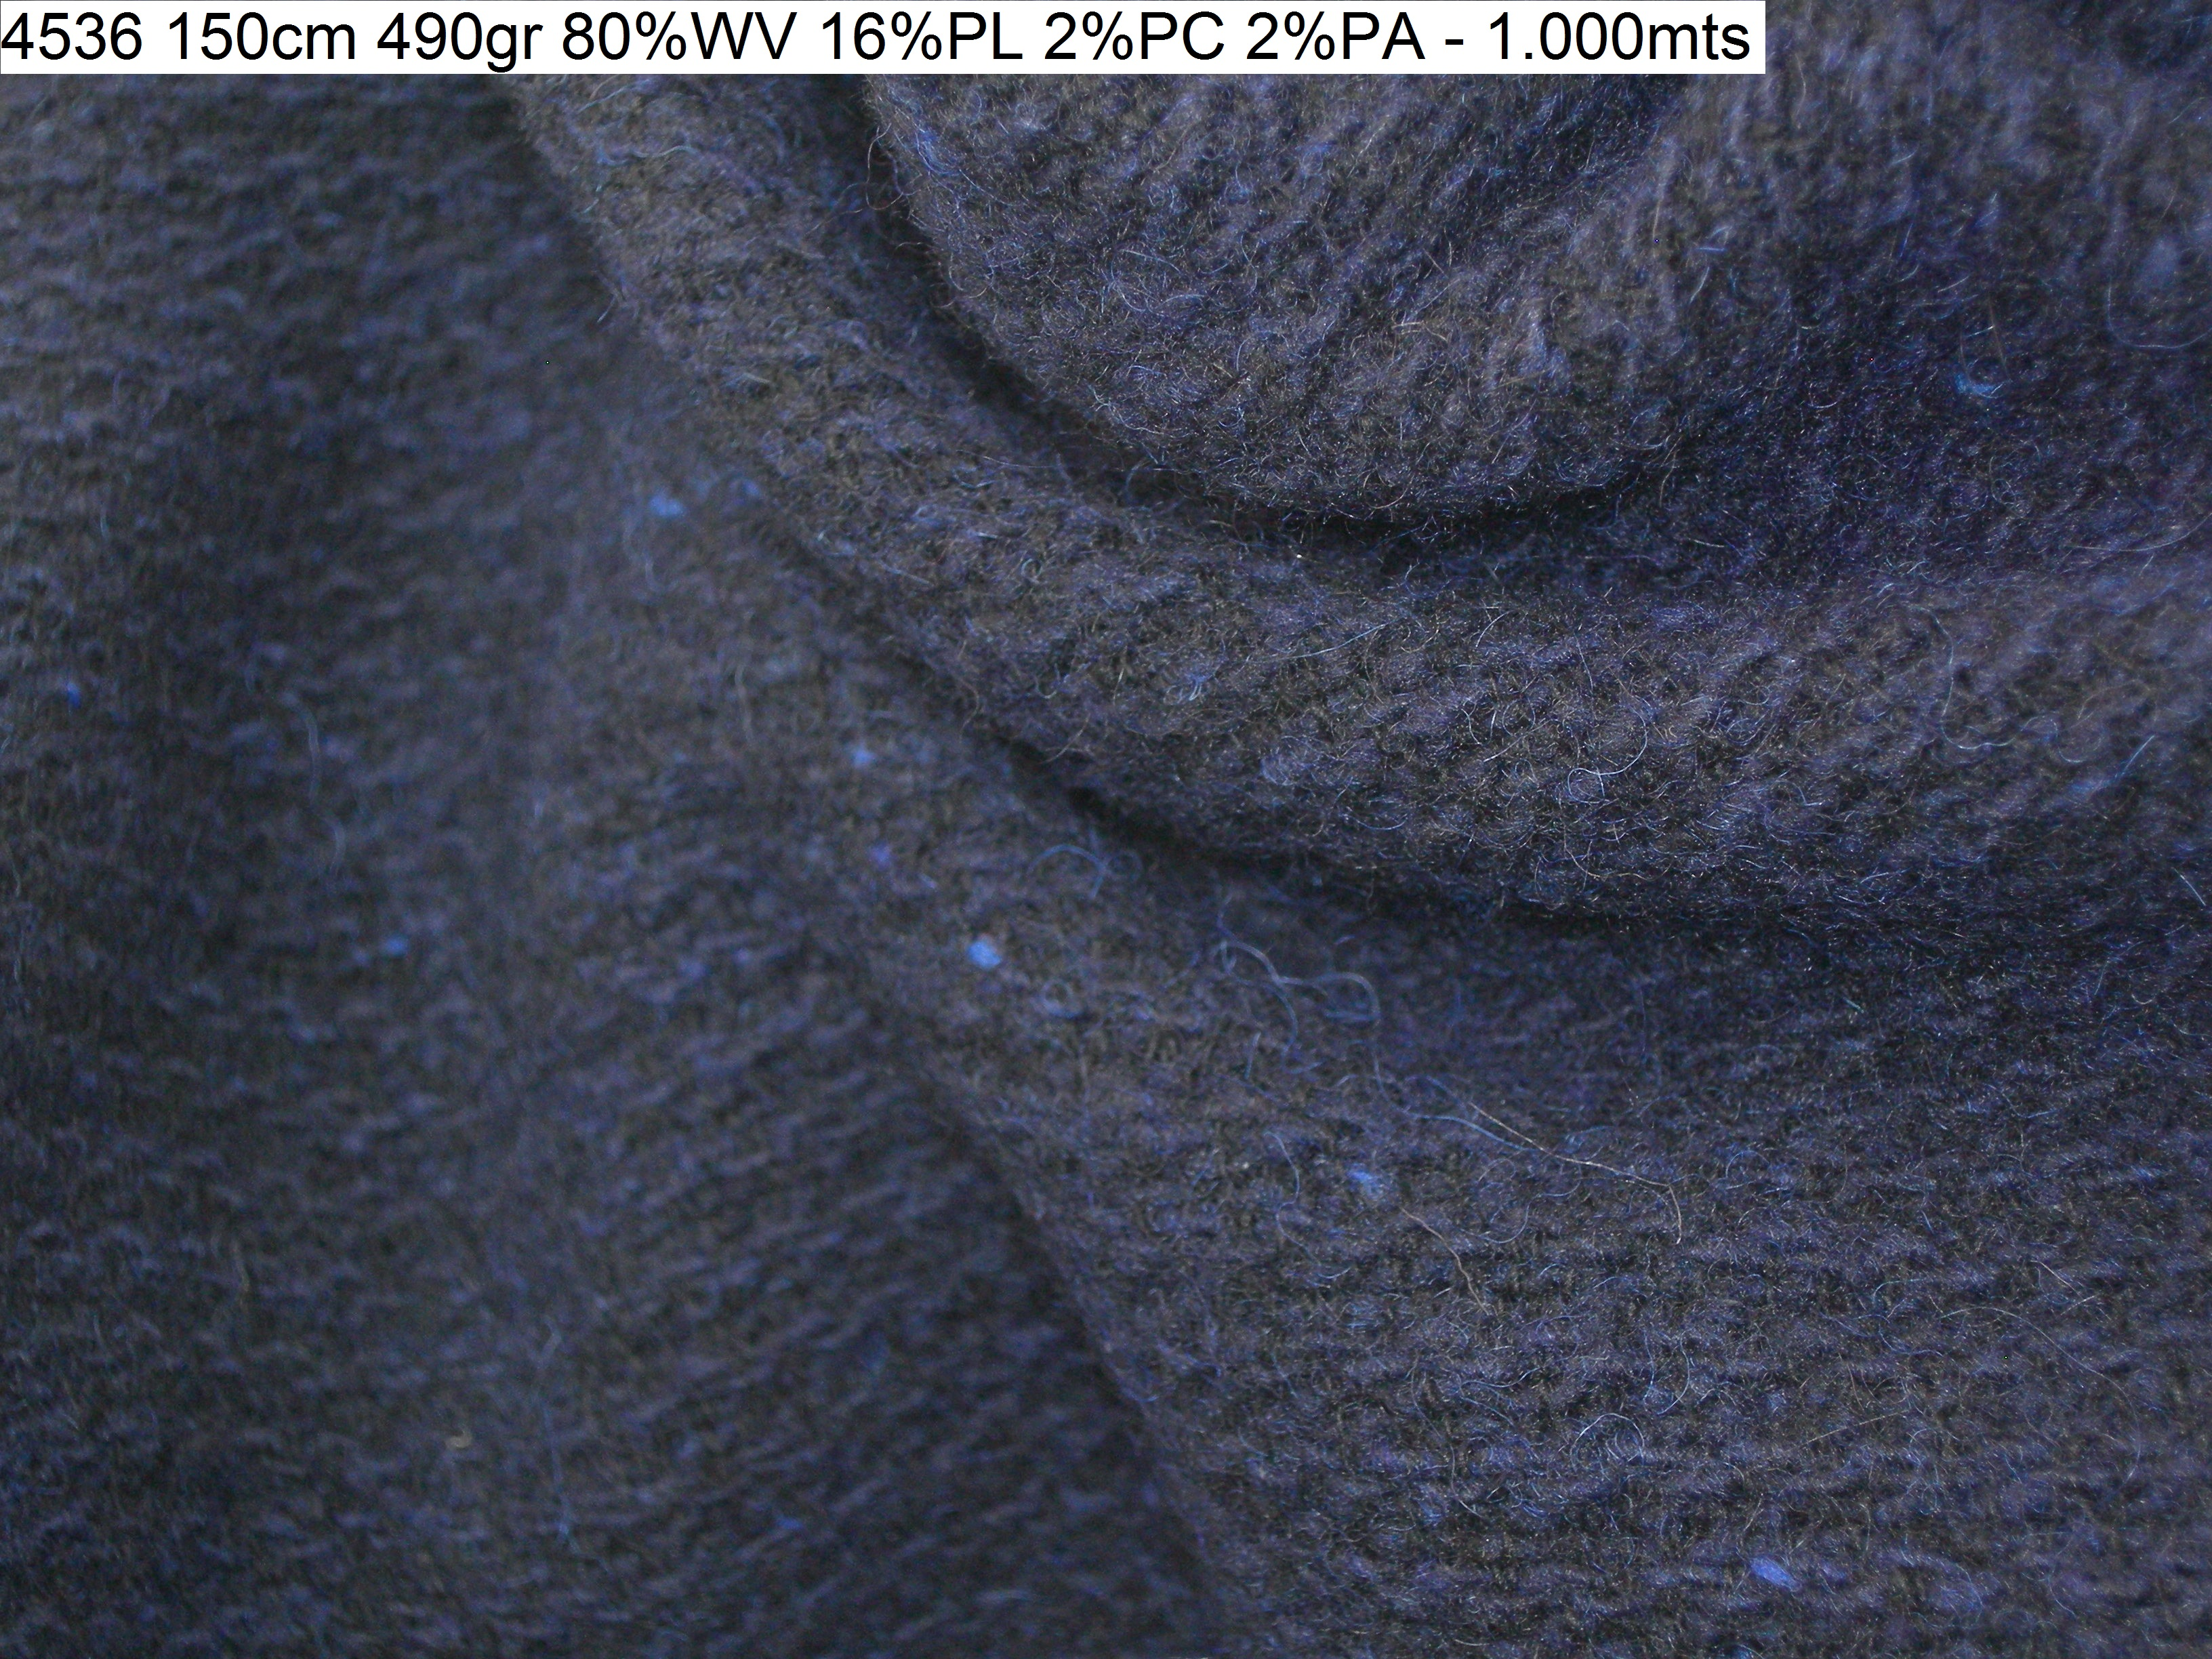 4536 boucle chanel coat fashion fabric